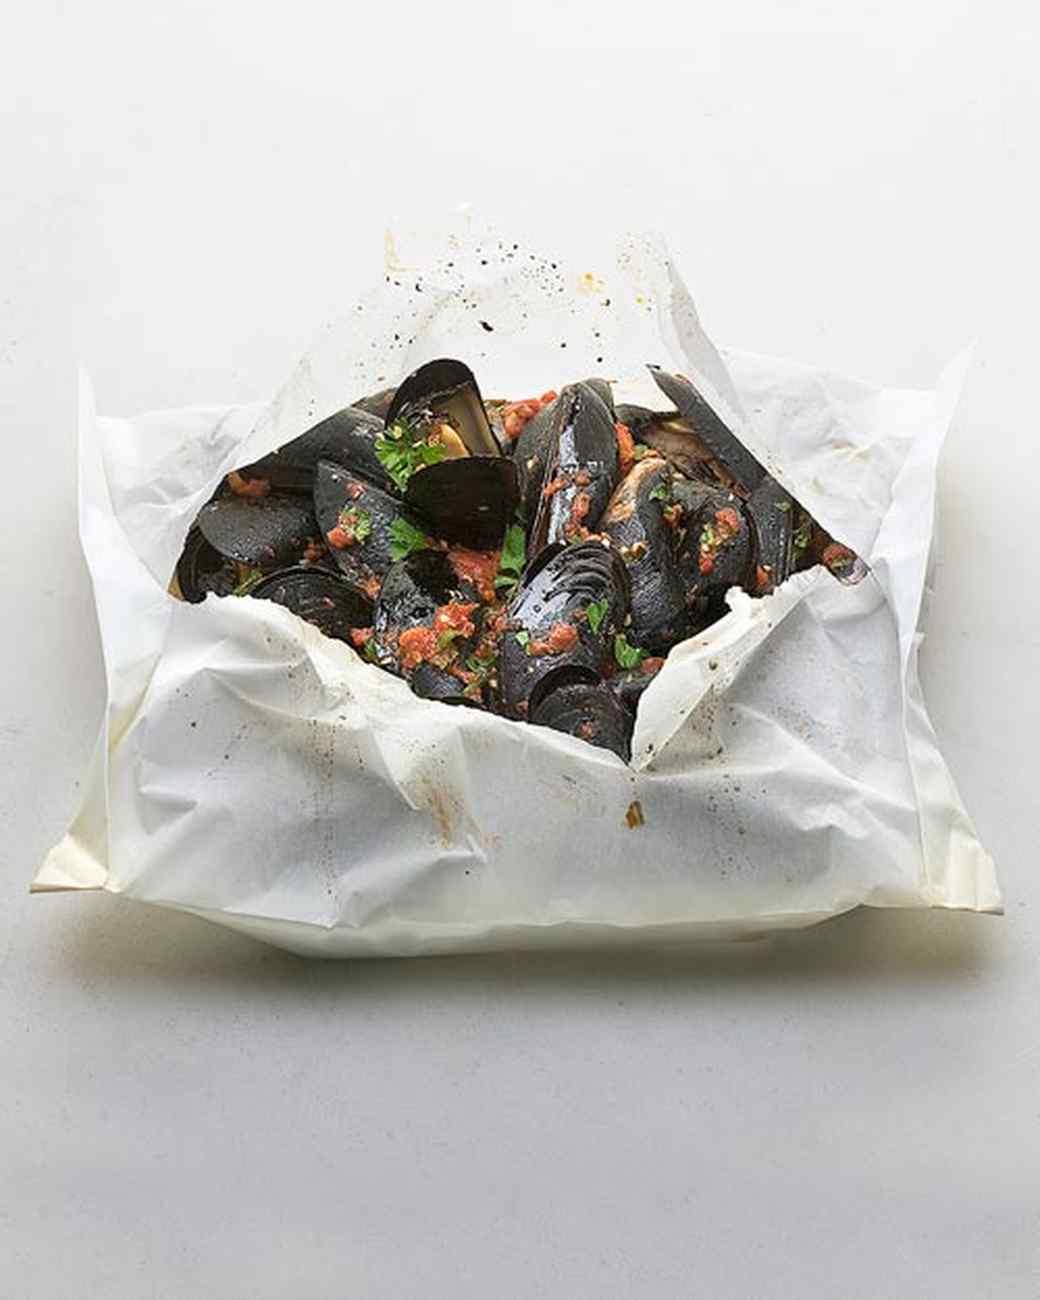 d101063_bf1v2116c_0105_mussels_tomato_sauce.jpg